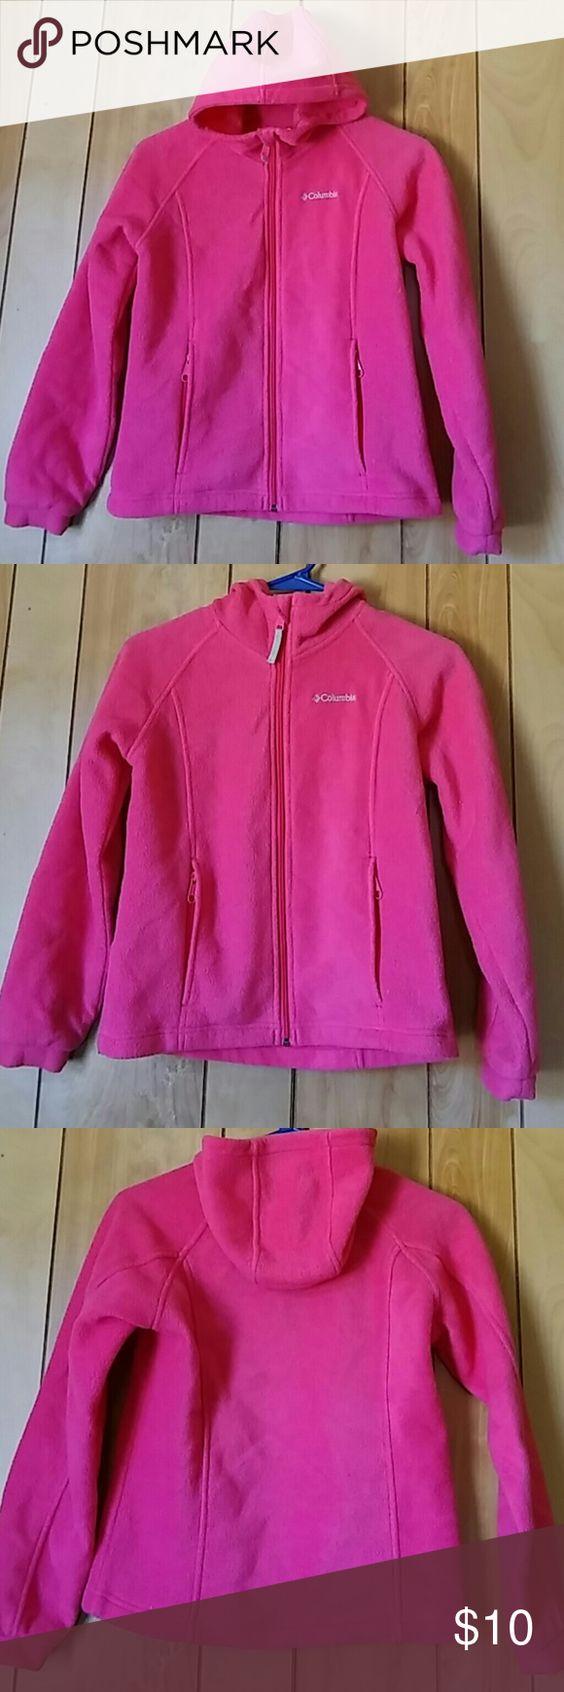 Columbia pink hoodie Columbia Sportswear Company Pink Zip up hoodie Columbia Shirts & Tops Sweatshirts & Hoodies